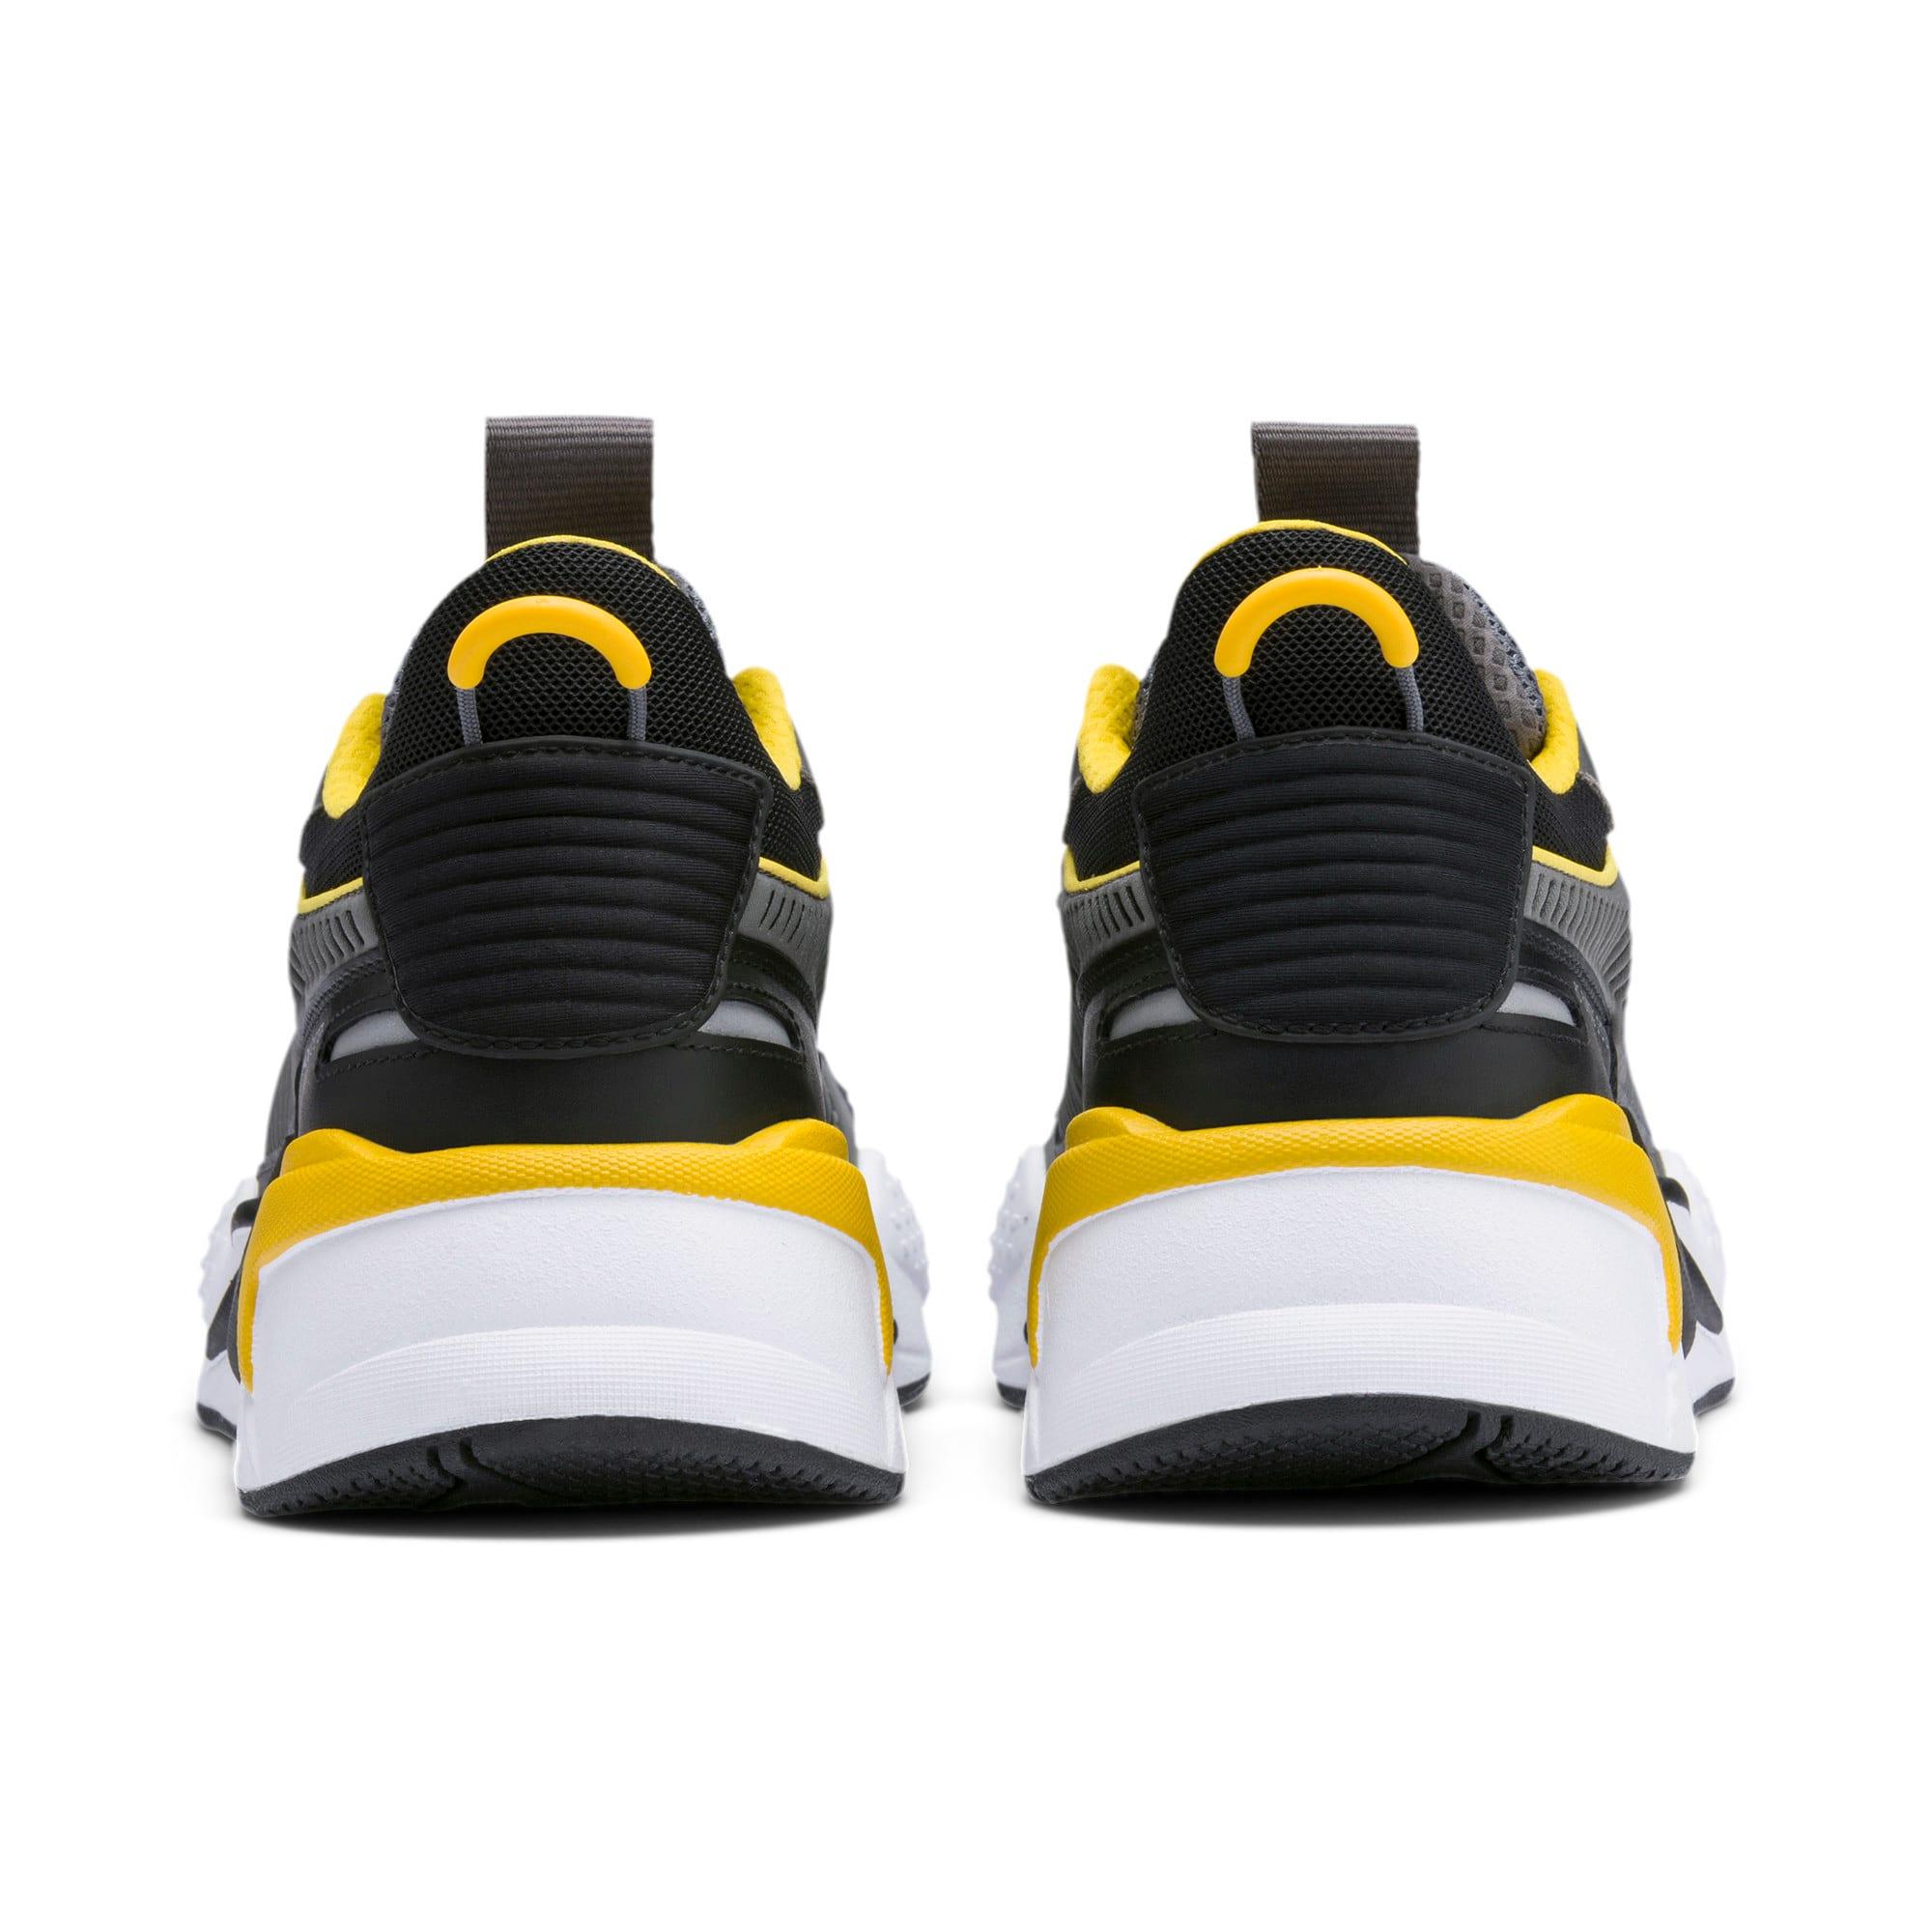 Thumbnail 4 of RS-X Core Sneakers, CASTLEROCK-Puma Black, medium